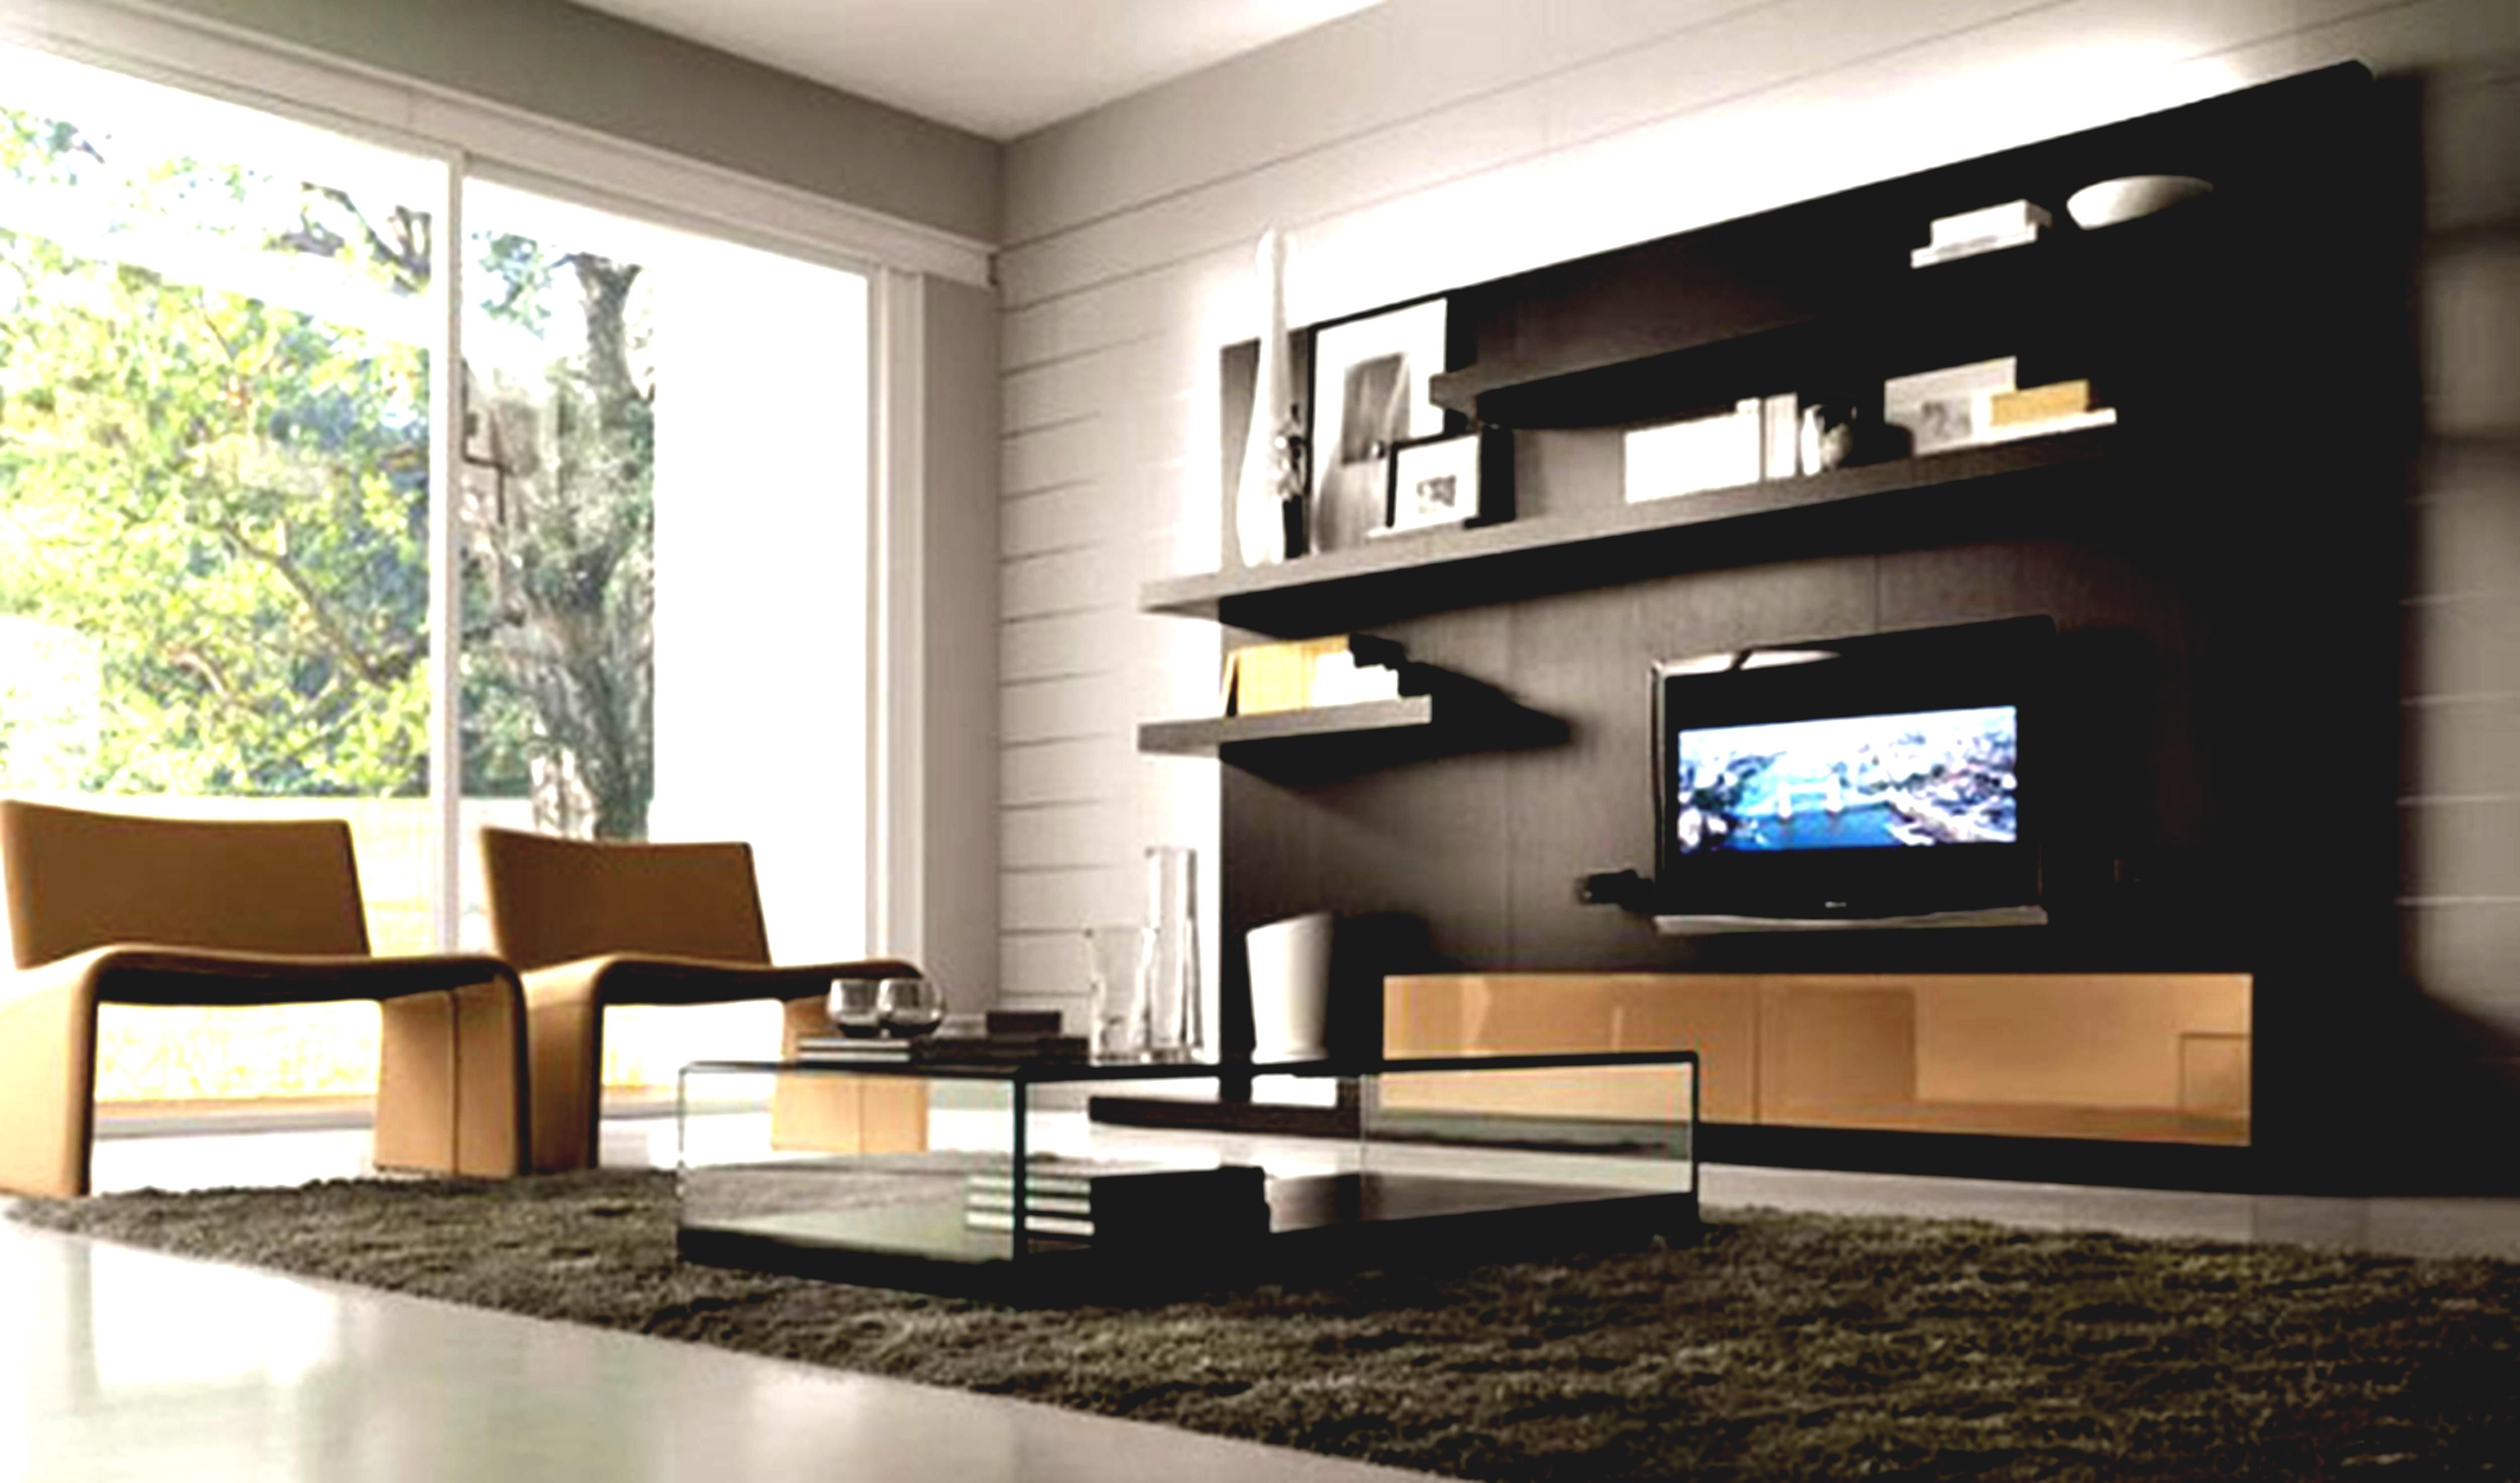 Image Result For Tv Room Paint Ideas Ikea Living Room Entertainment Center Tv Room Design Living Room Entertainment